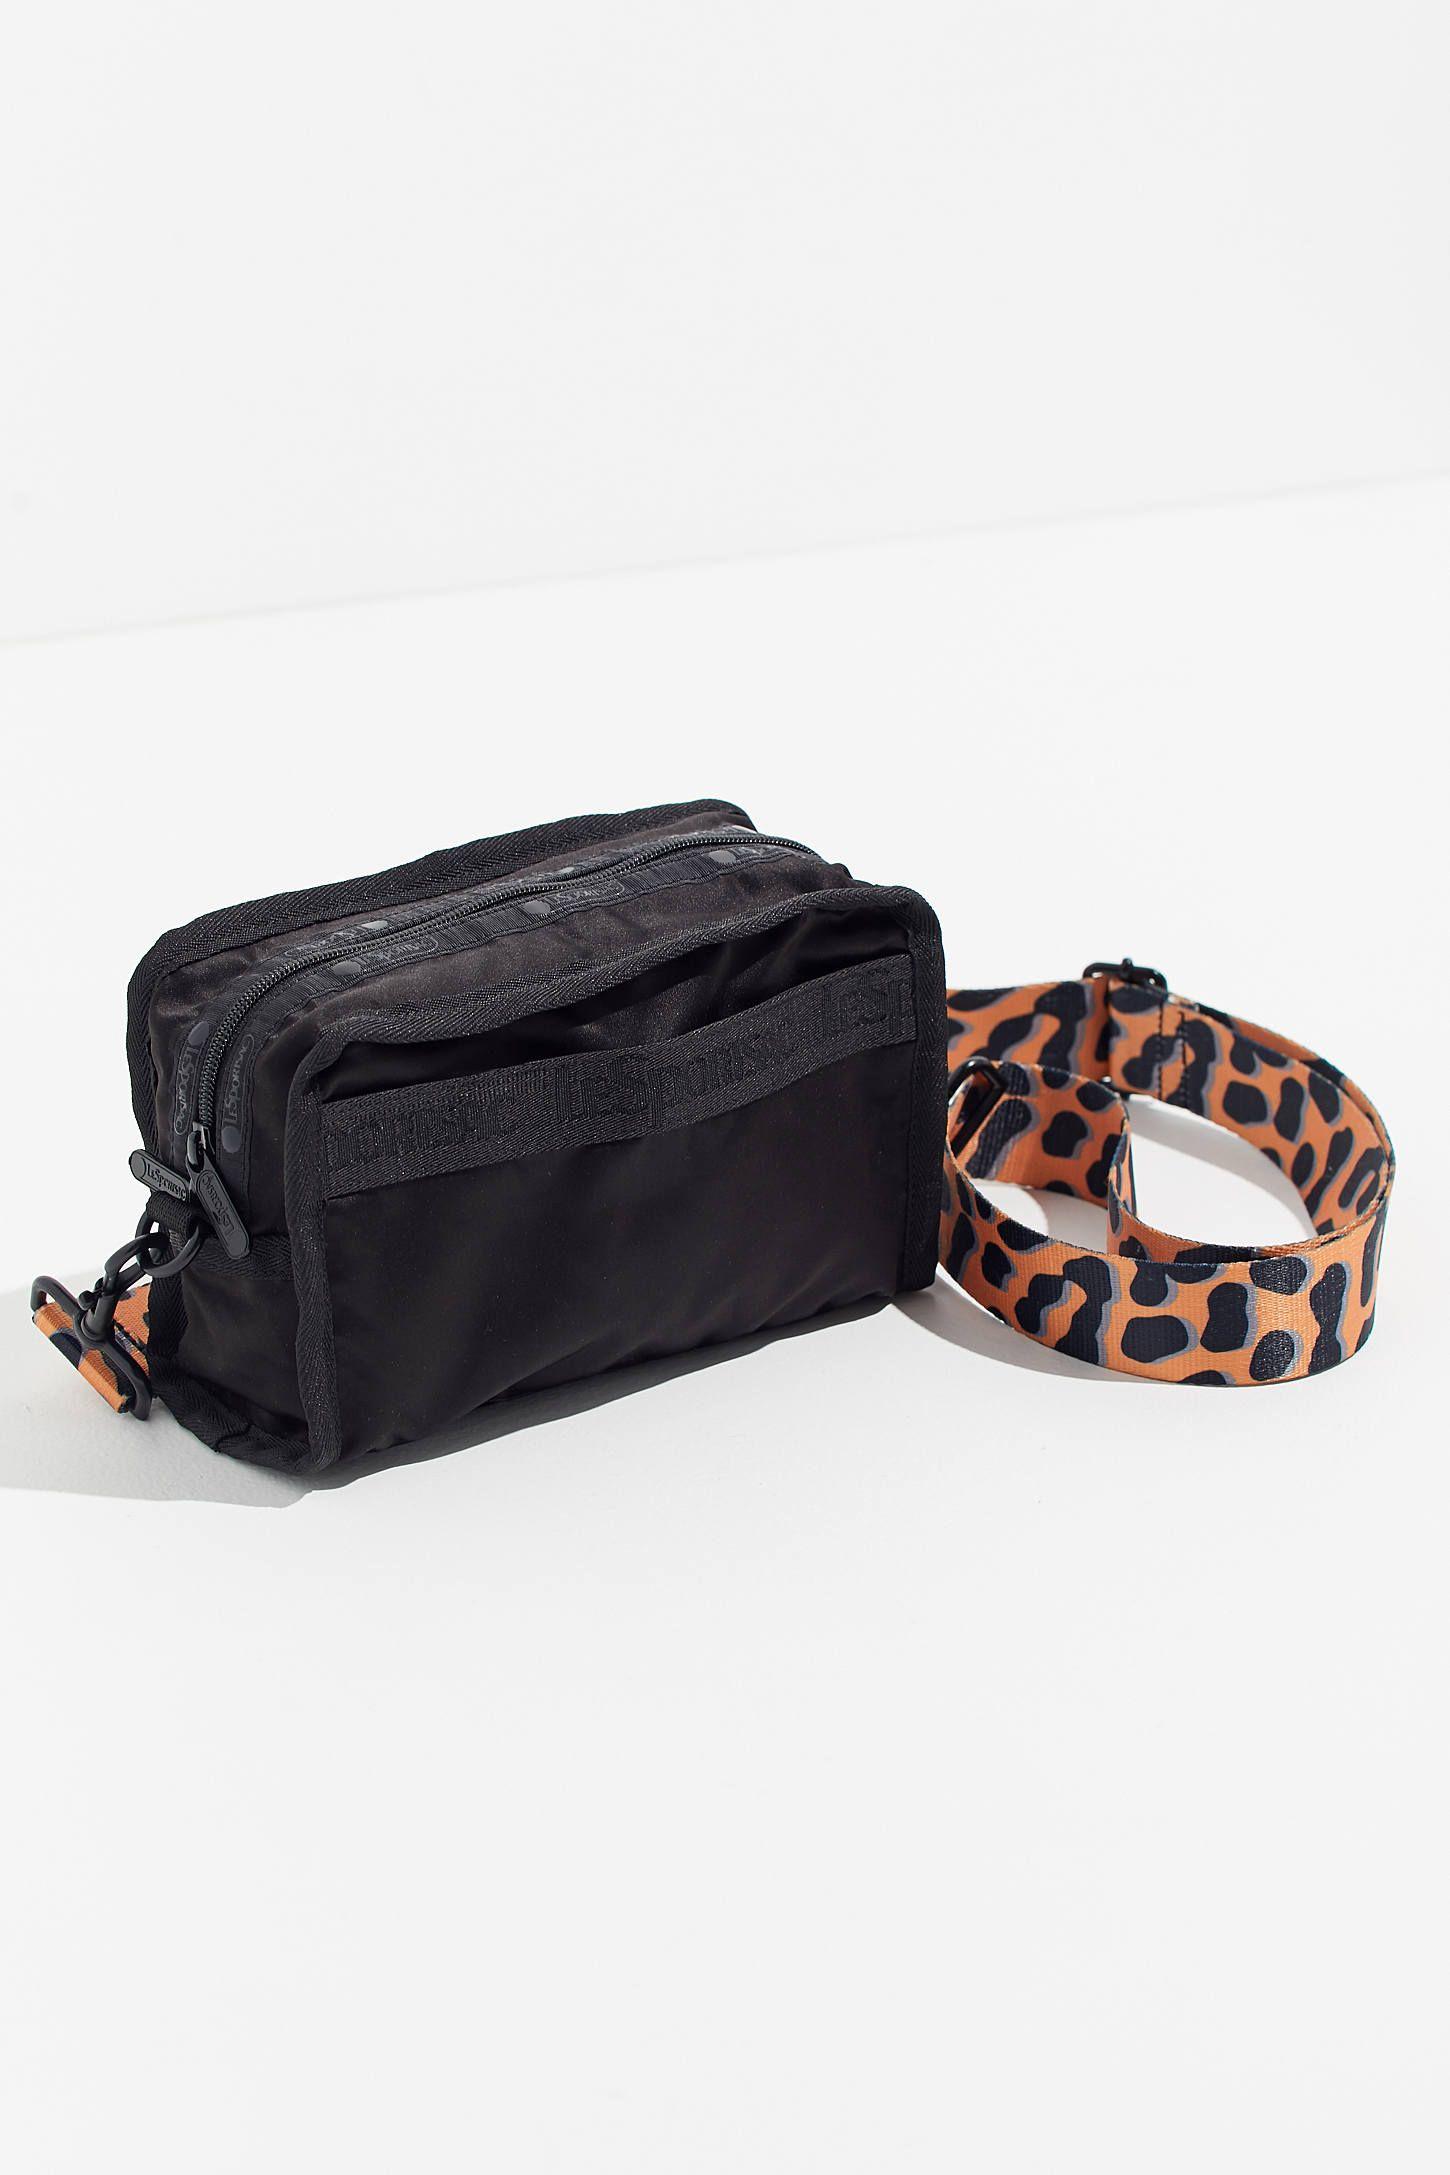 c4fb156d702e LeSportsac Taylor Crossbody Bag in 2019   .fashion.   Bags ...